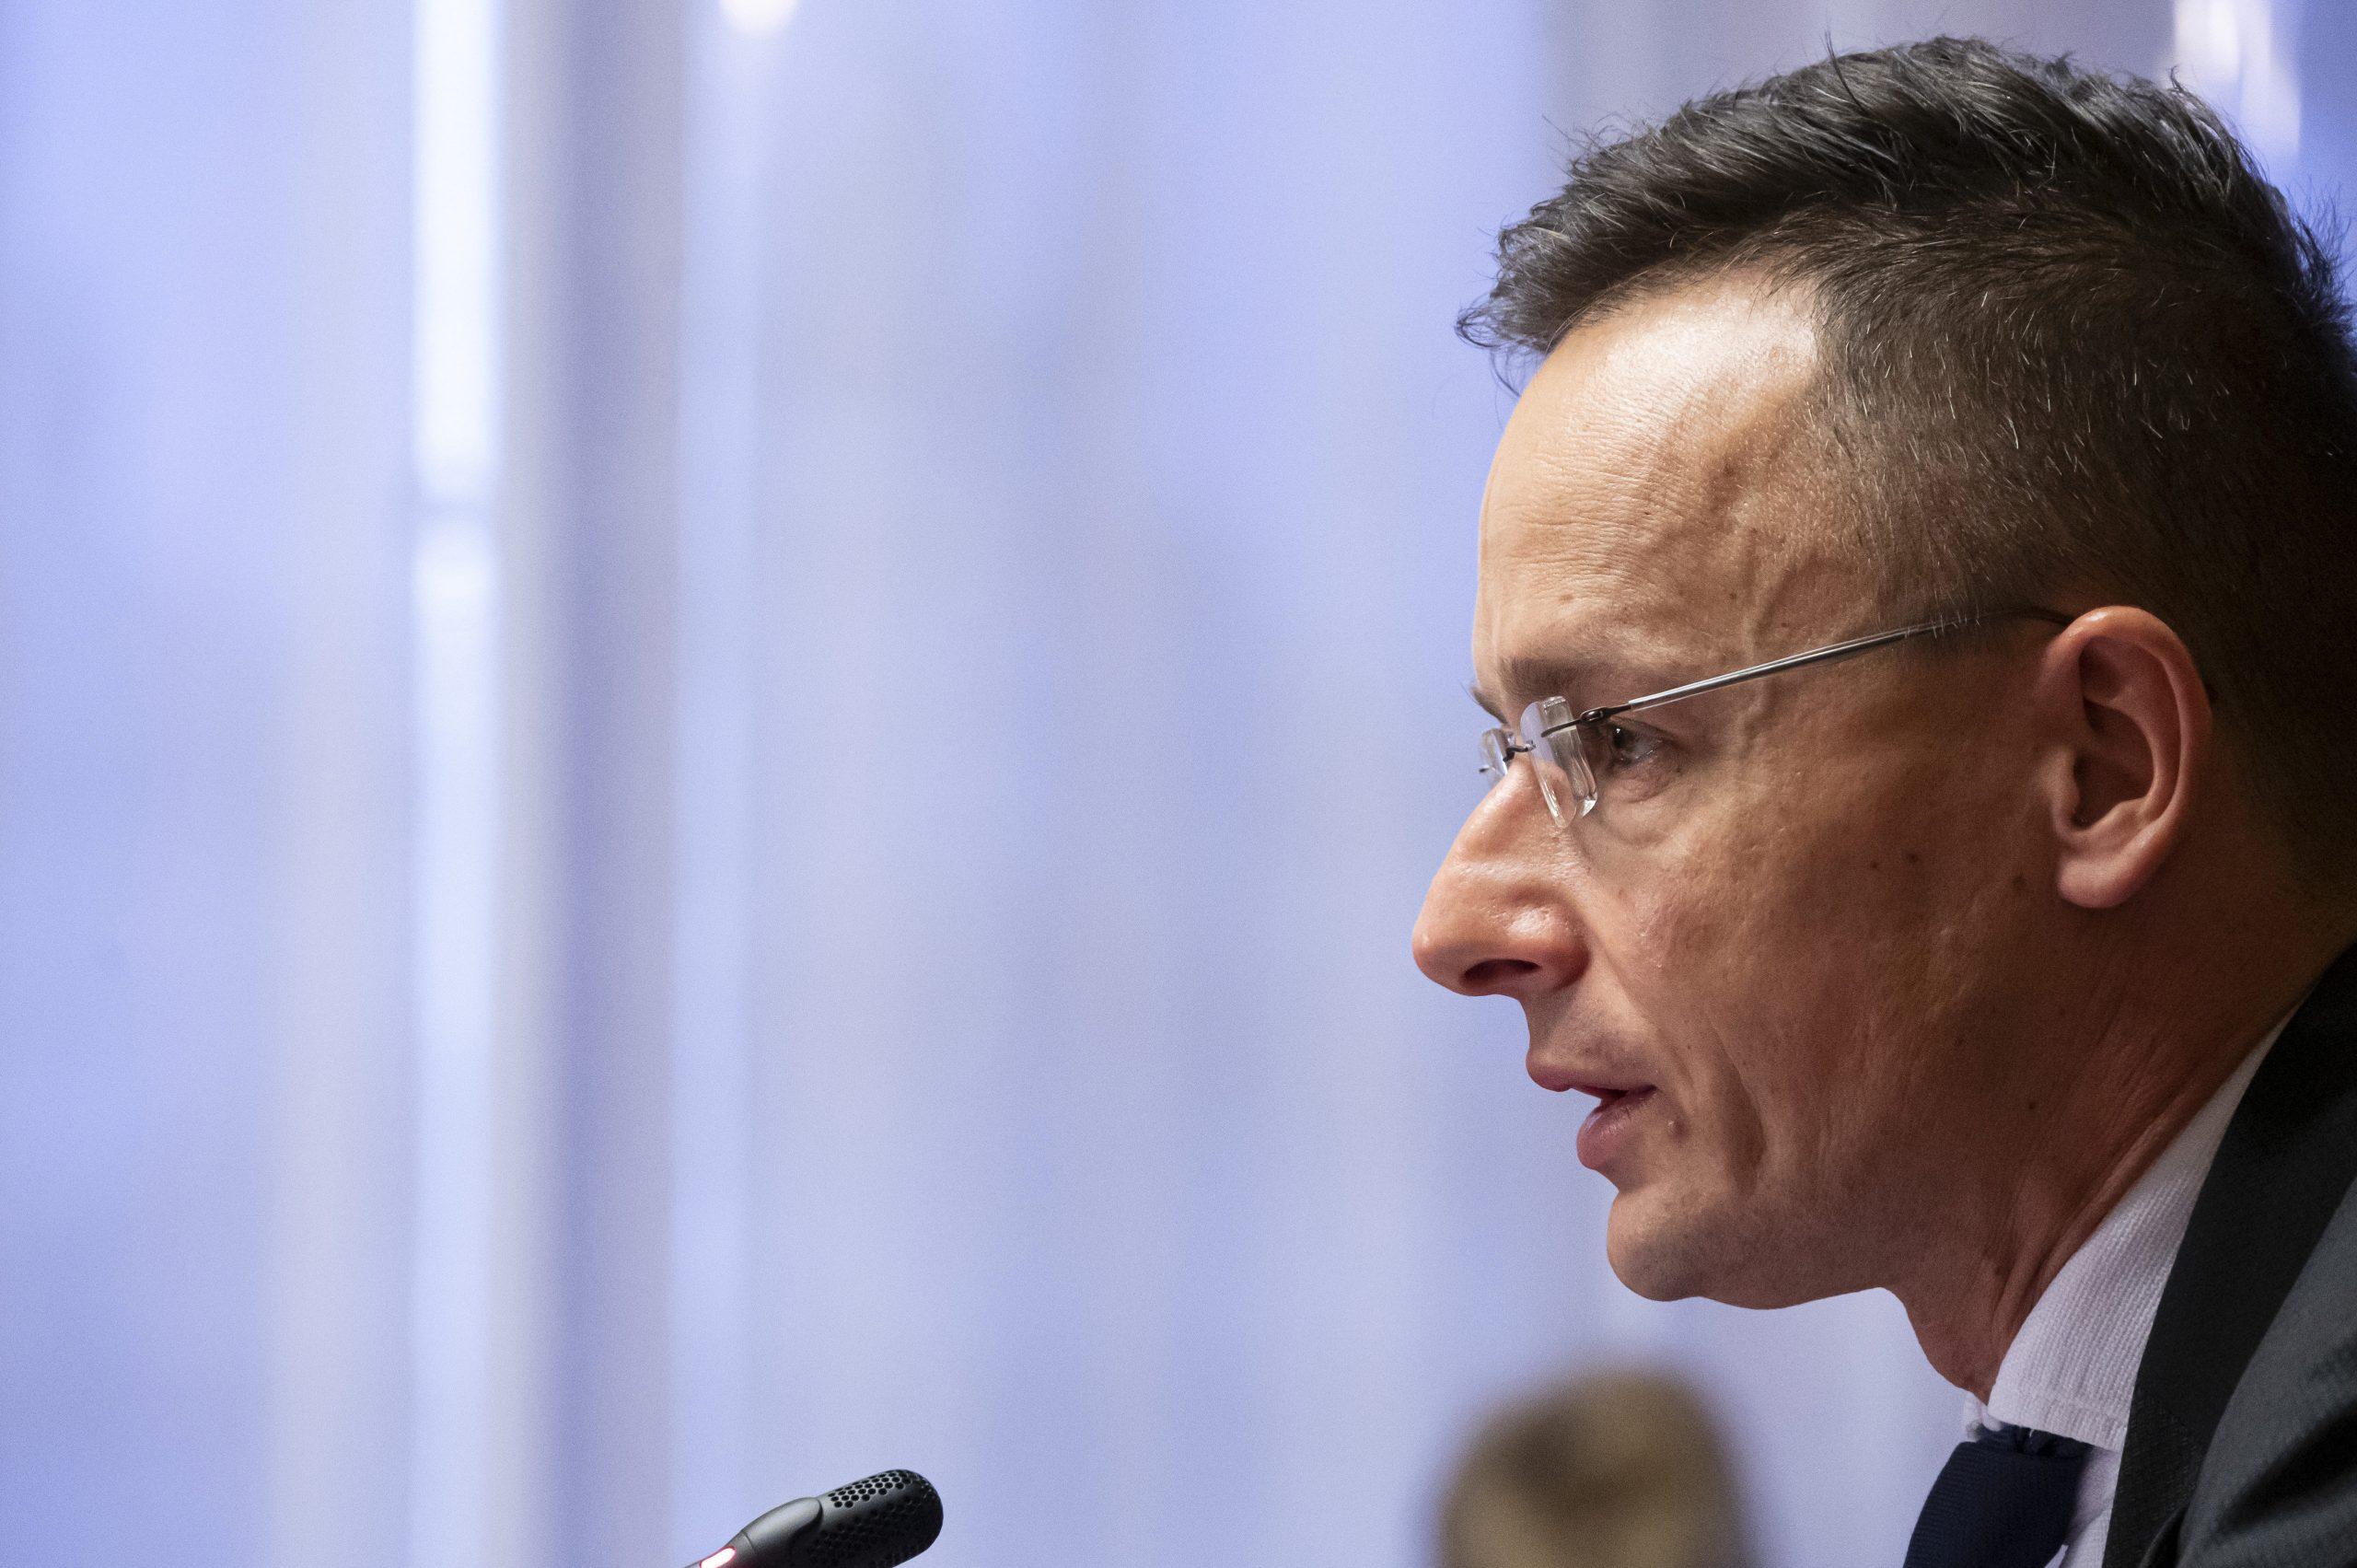 FM Szijjártó: Hungary Open to Cooperation with Biden, Demands Respect